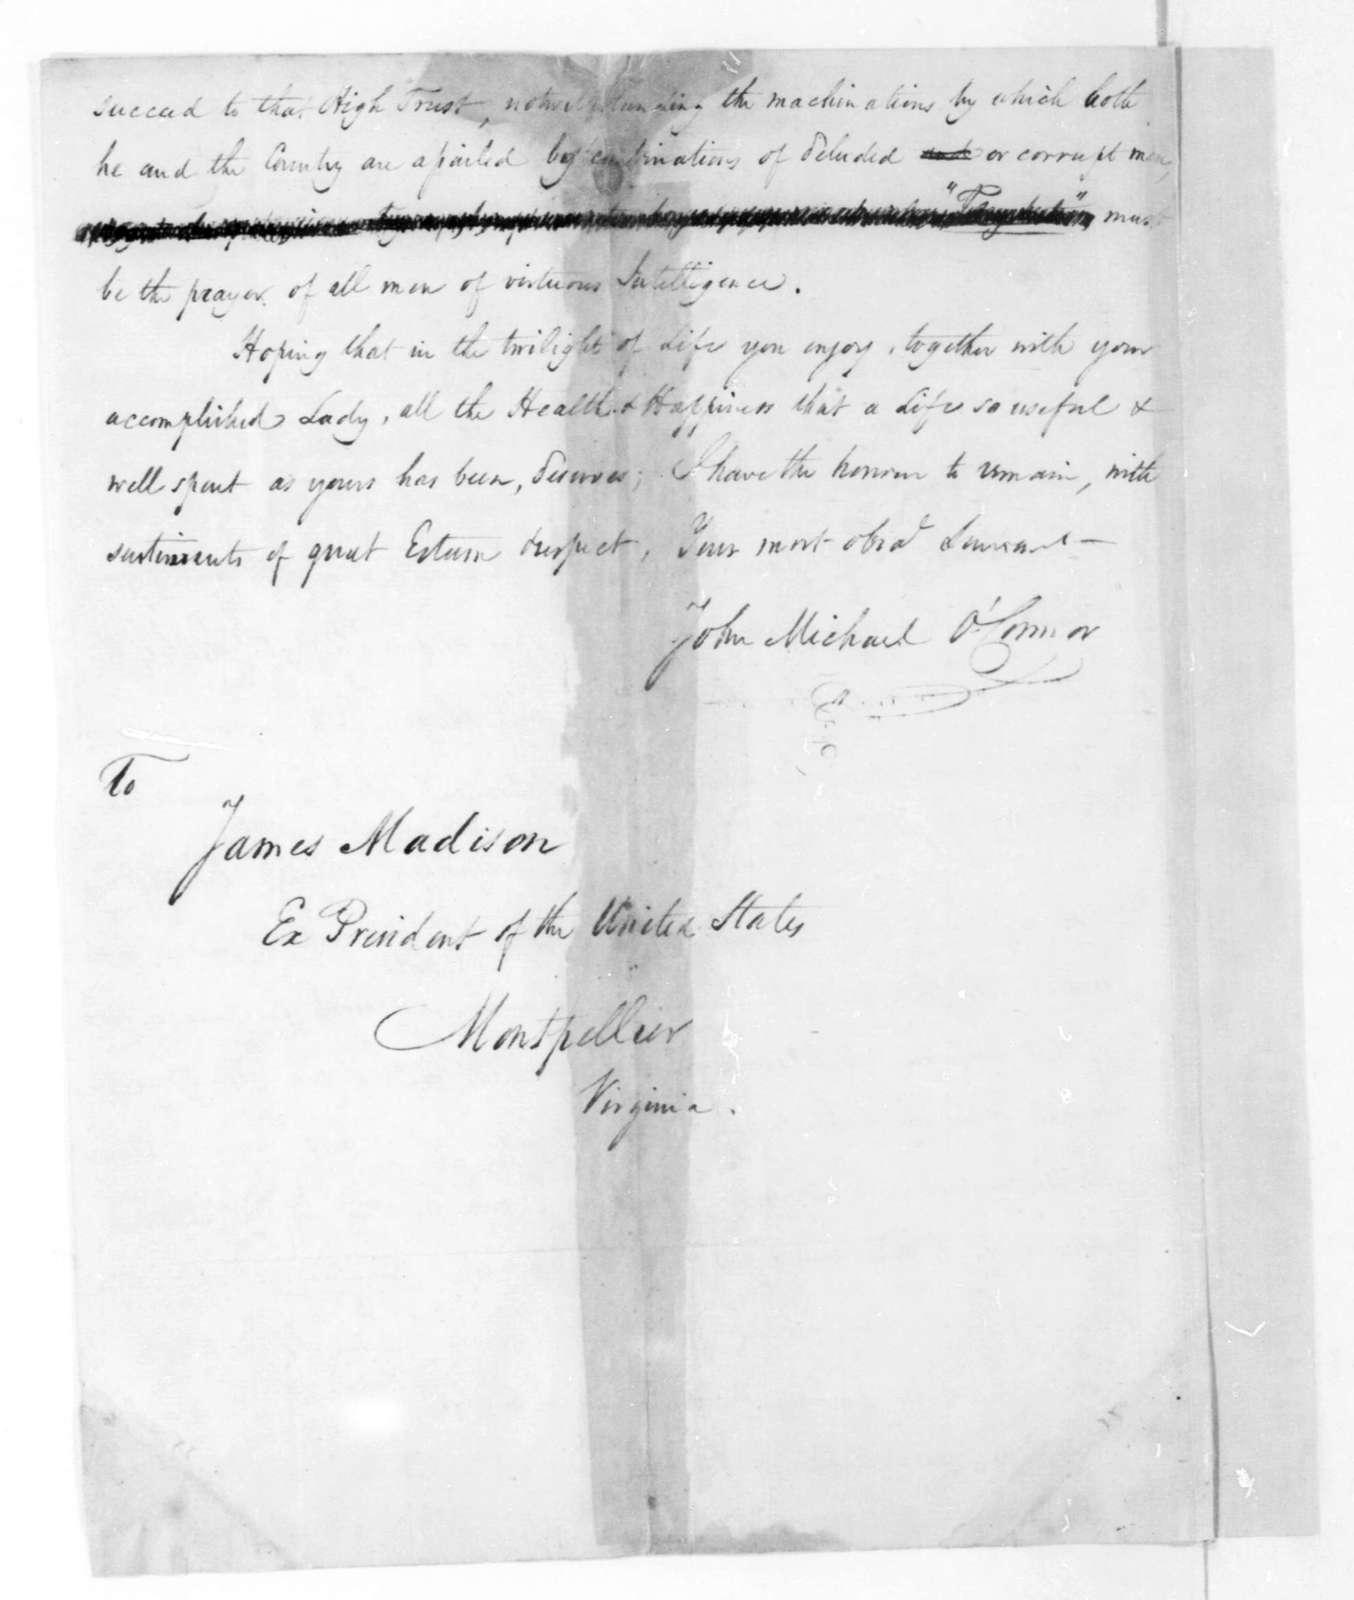 John Michael O'Connor to James Madison, April 29, 1824.